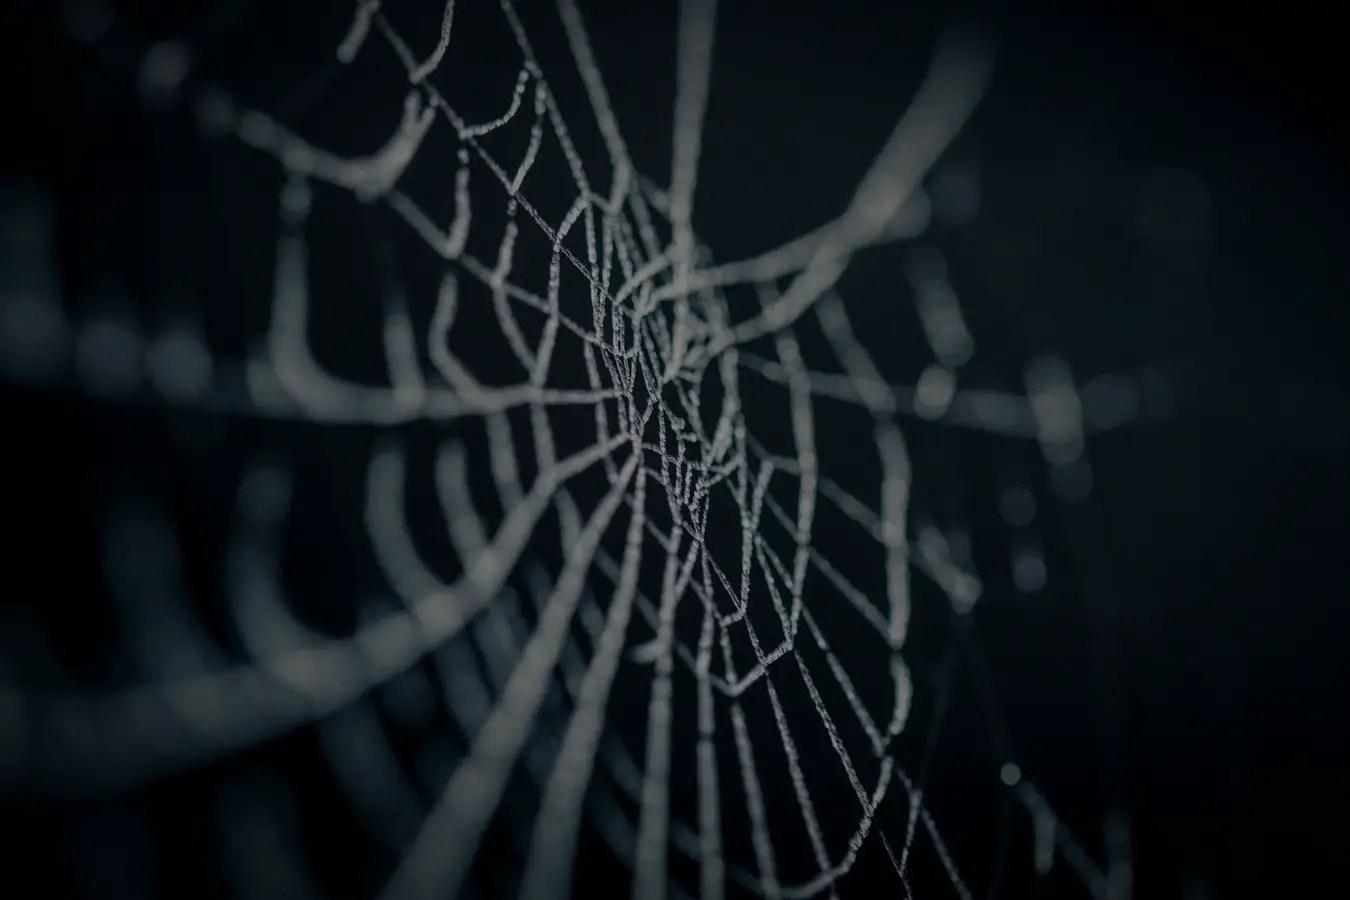 Haunting Halloween Guide 2020. spiderweb